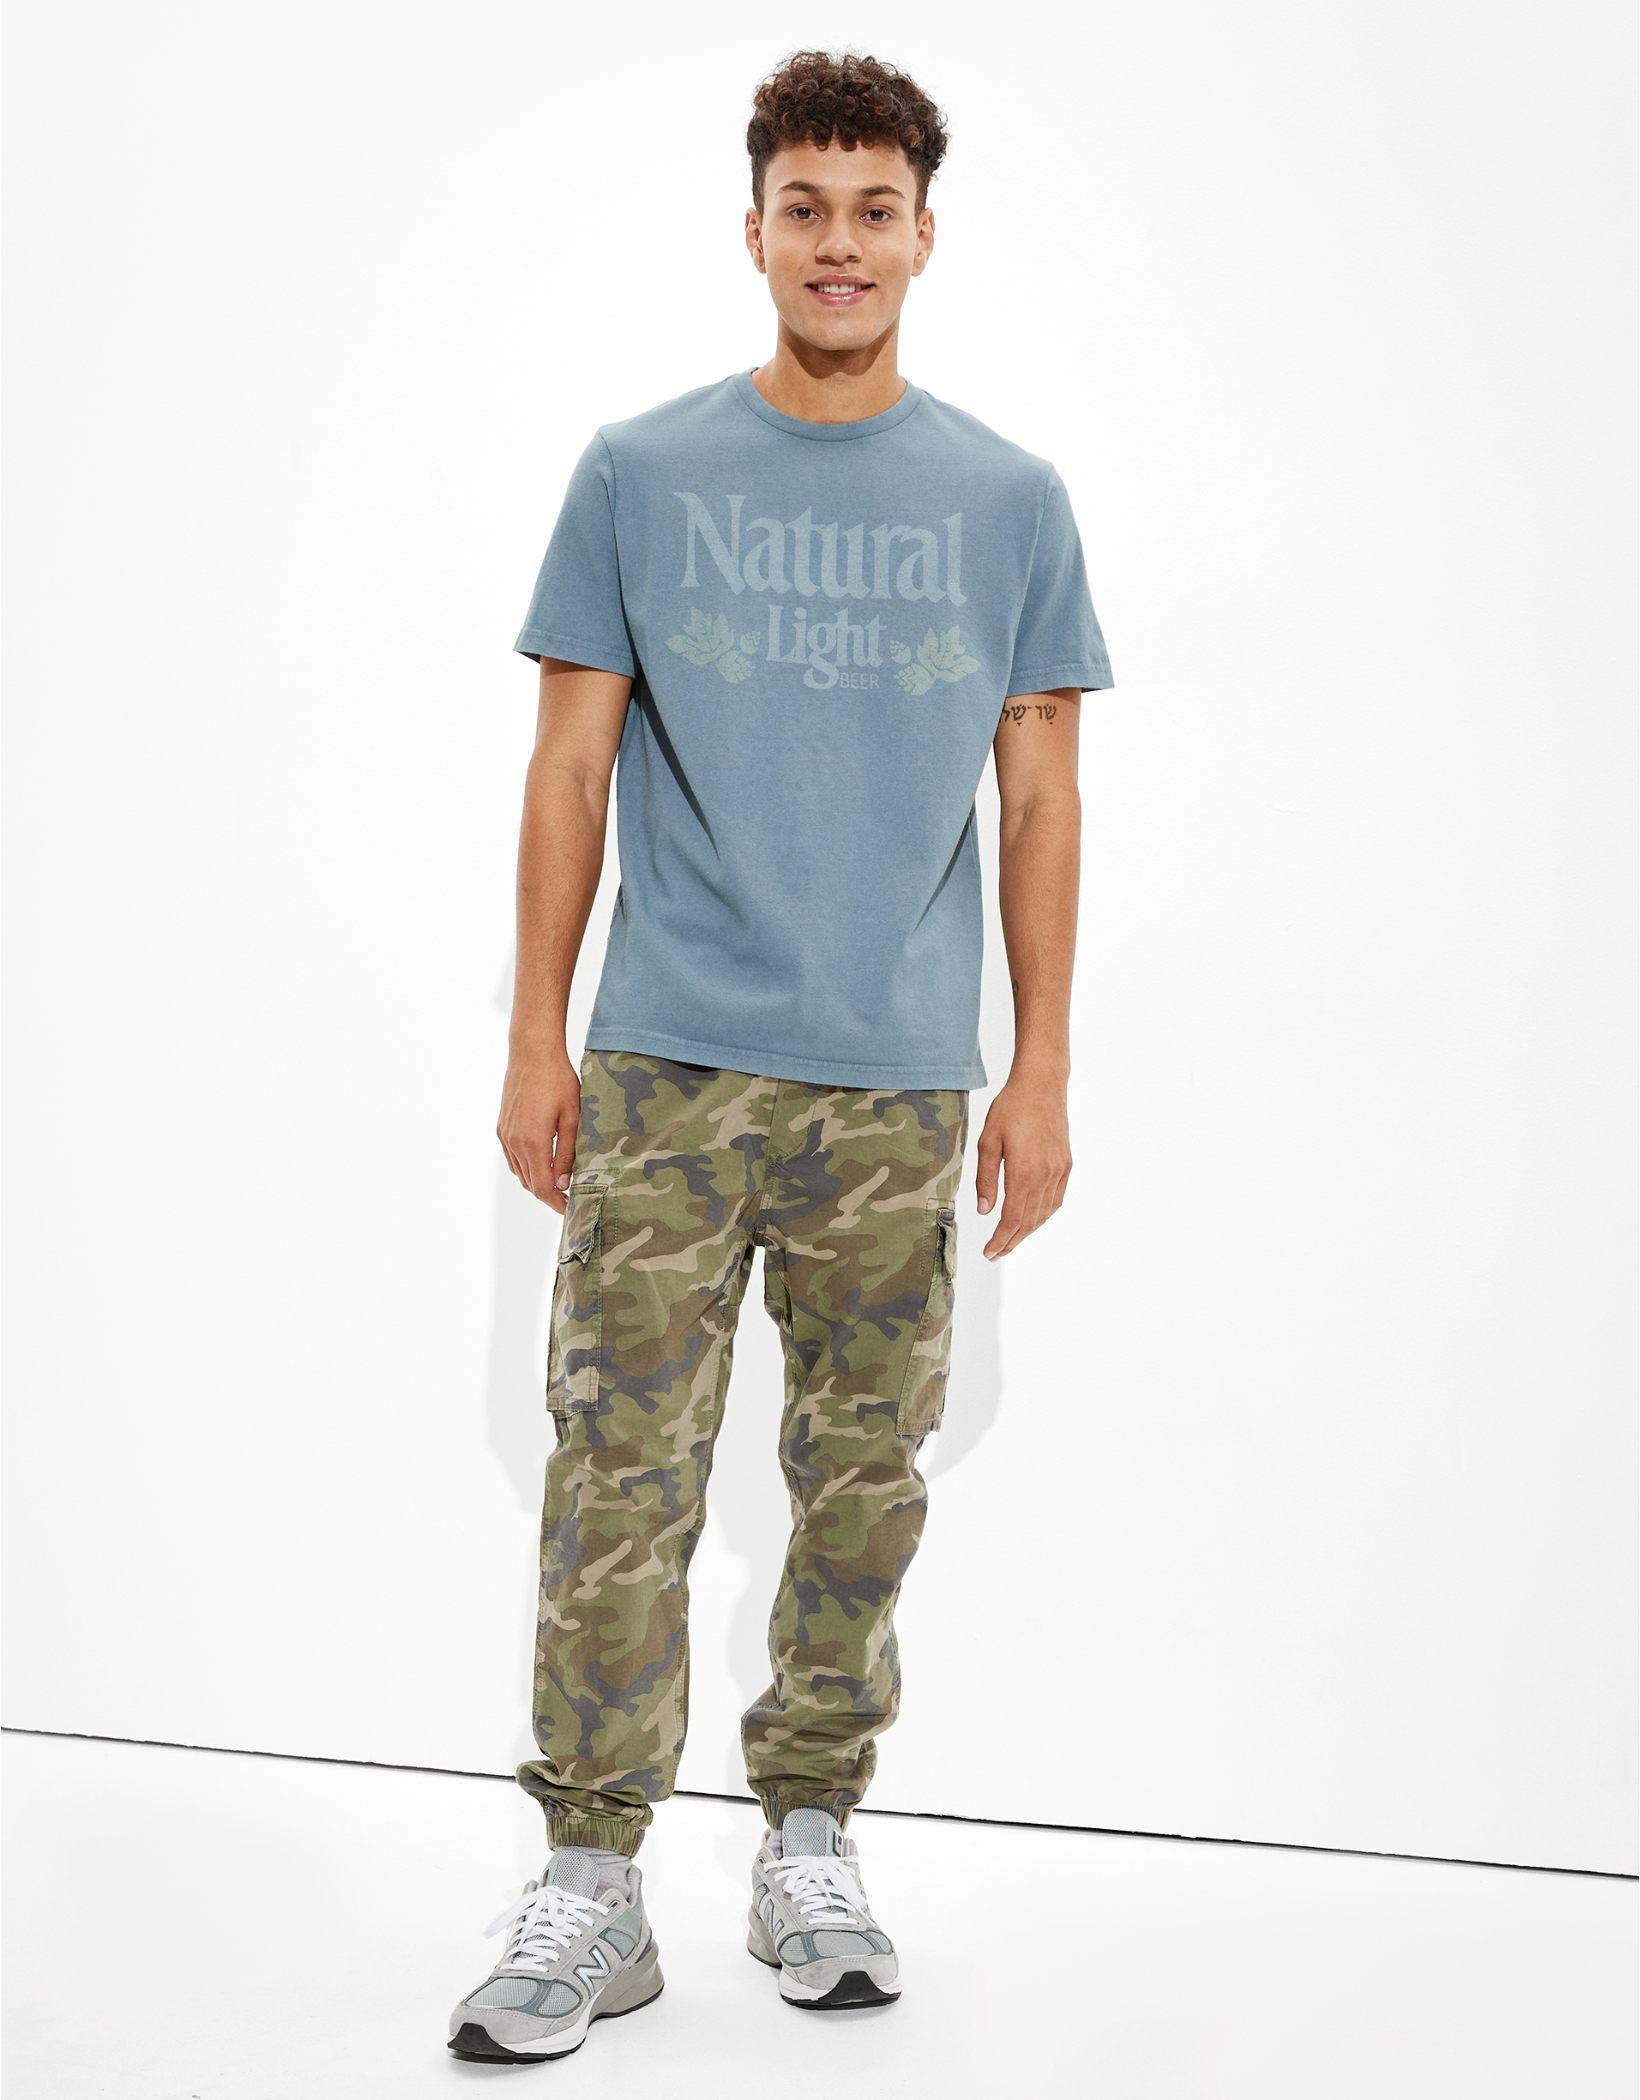 Tailgate Men's Natural Light Beer Graphic T-Shirt